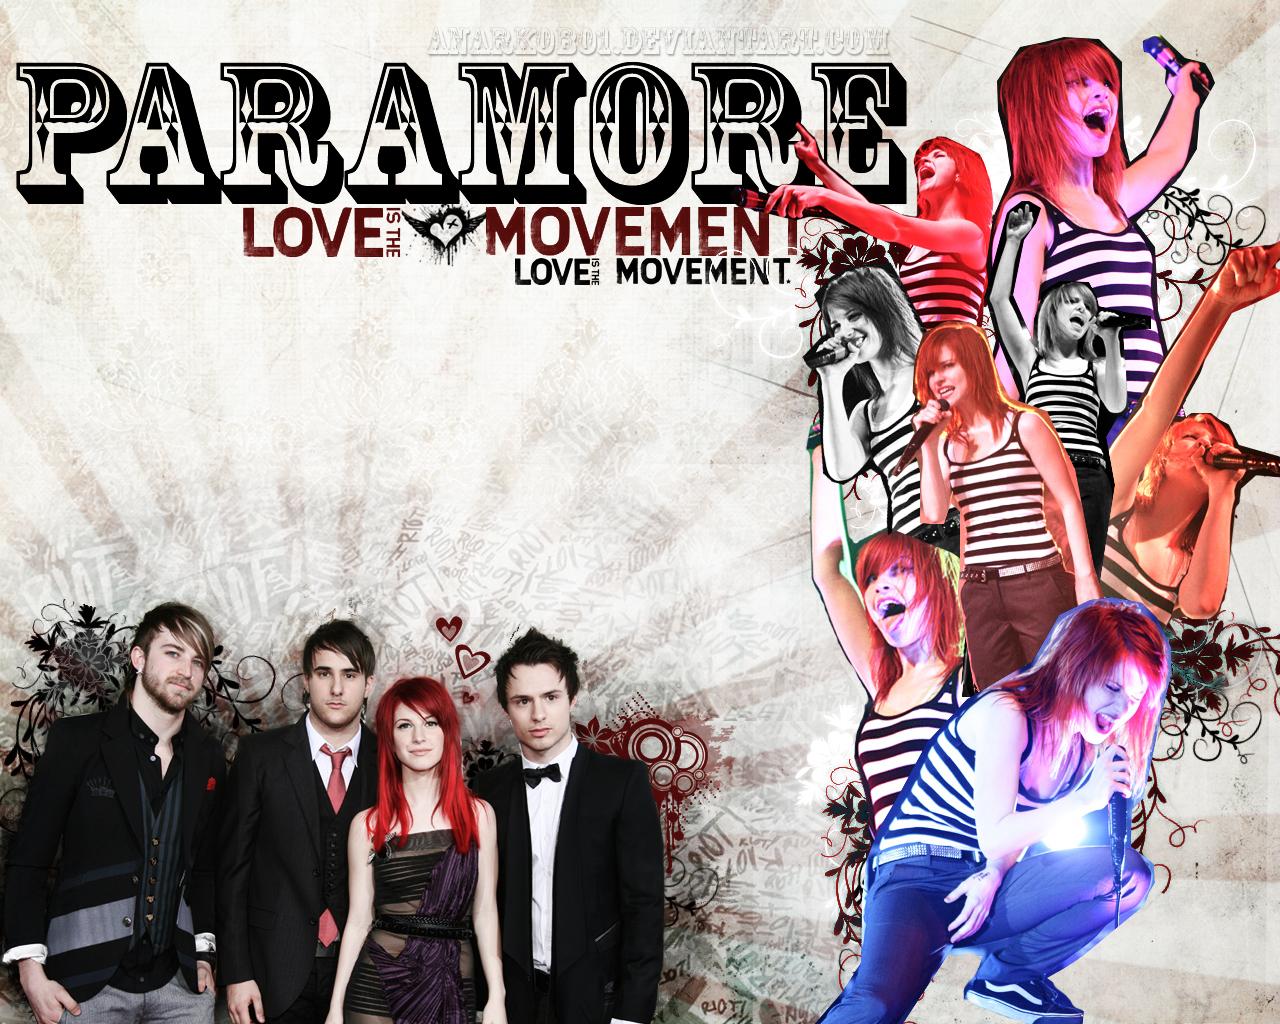 http://3.bp.blogspot.com/-2E836OVURHU/TfeJYuhktOI/AAAAAAAAAdQ/P78a8_Bw4uk/s1600/Paramore_Wallpaper_by_anarkoBO1%255B1%255D.jpg